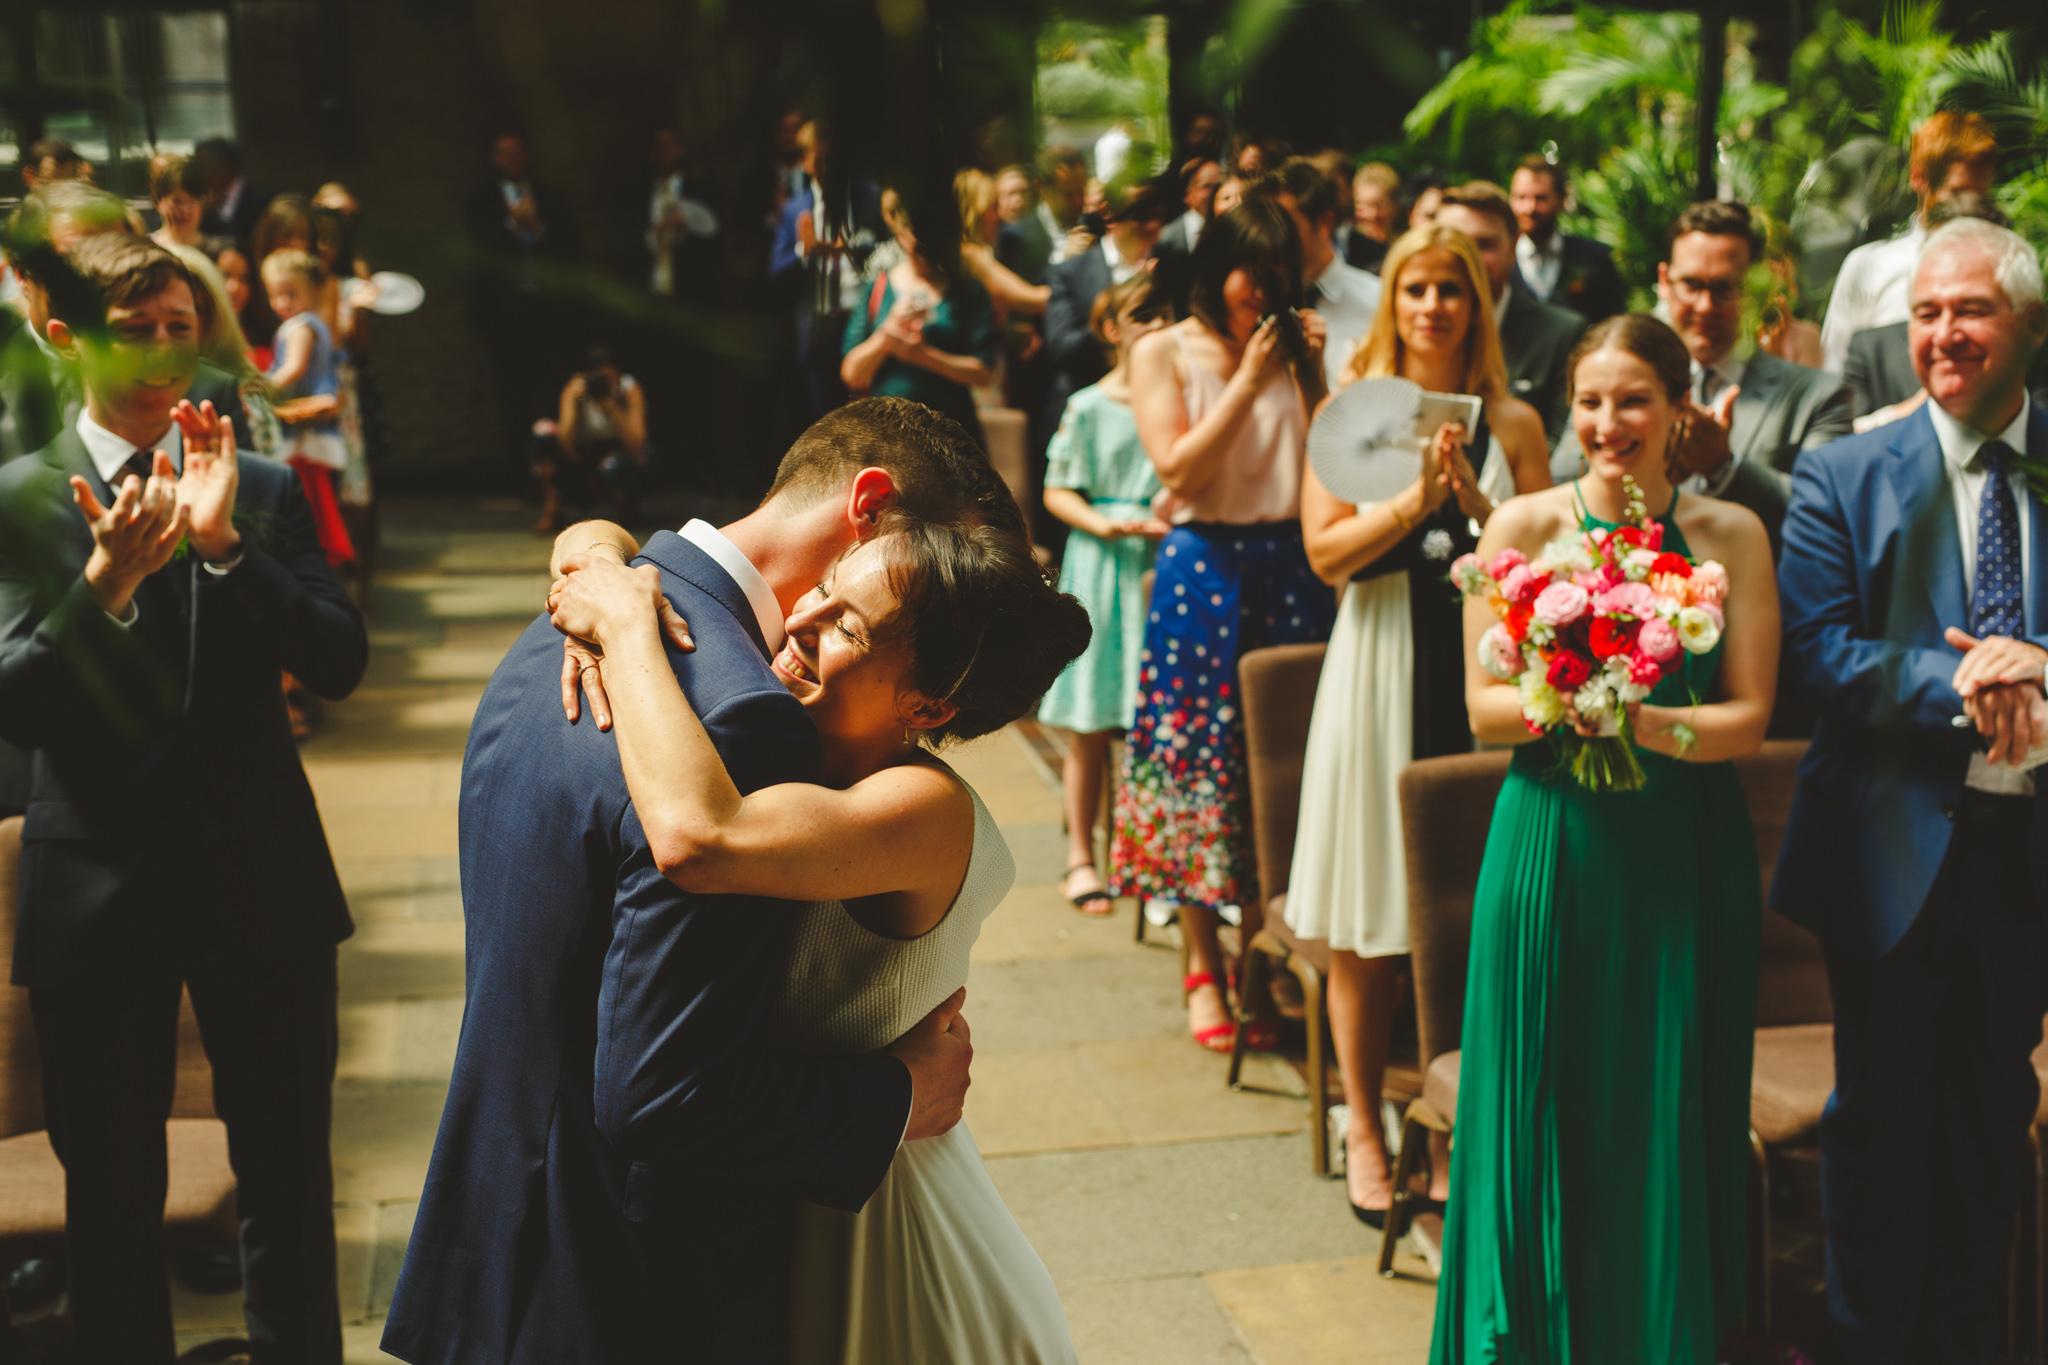 derbyshire-wedding-photographer-videographer-camera-hannah-37.jpg